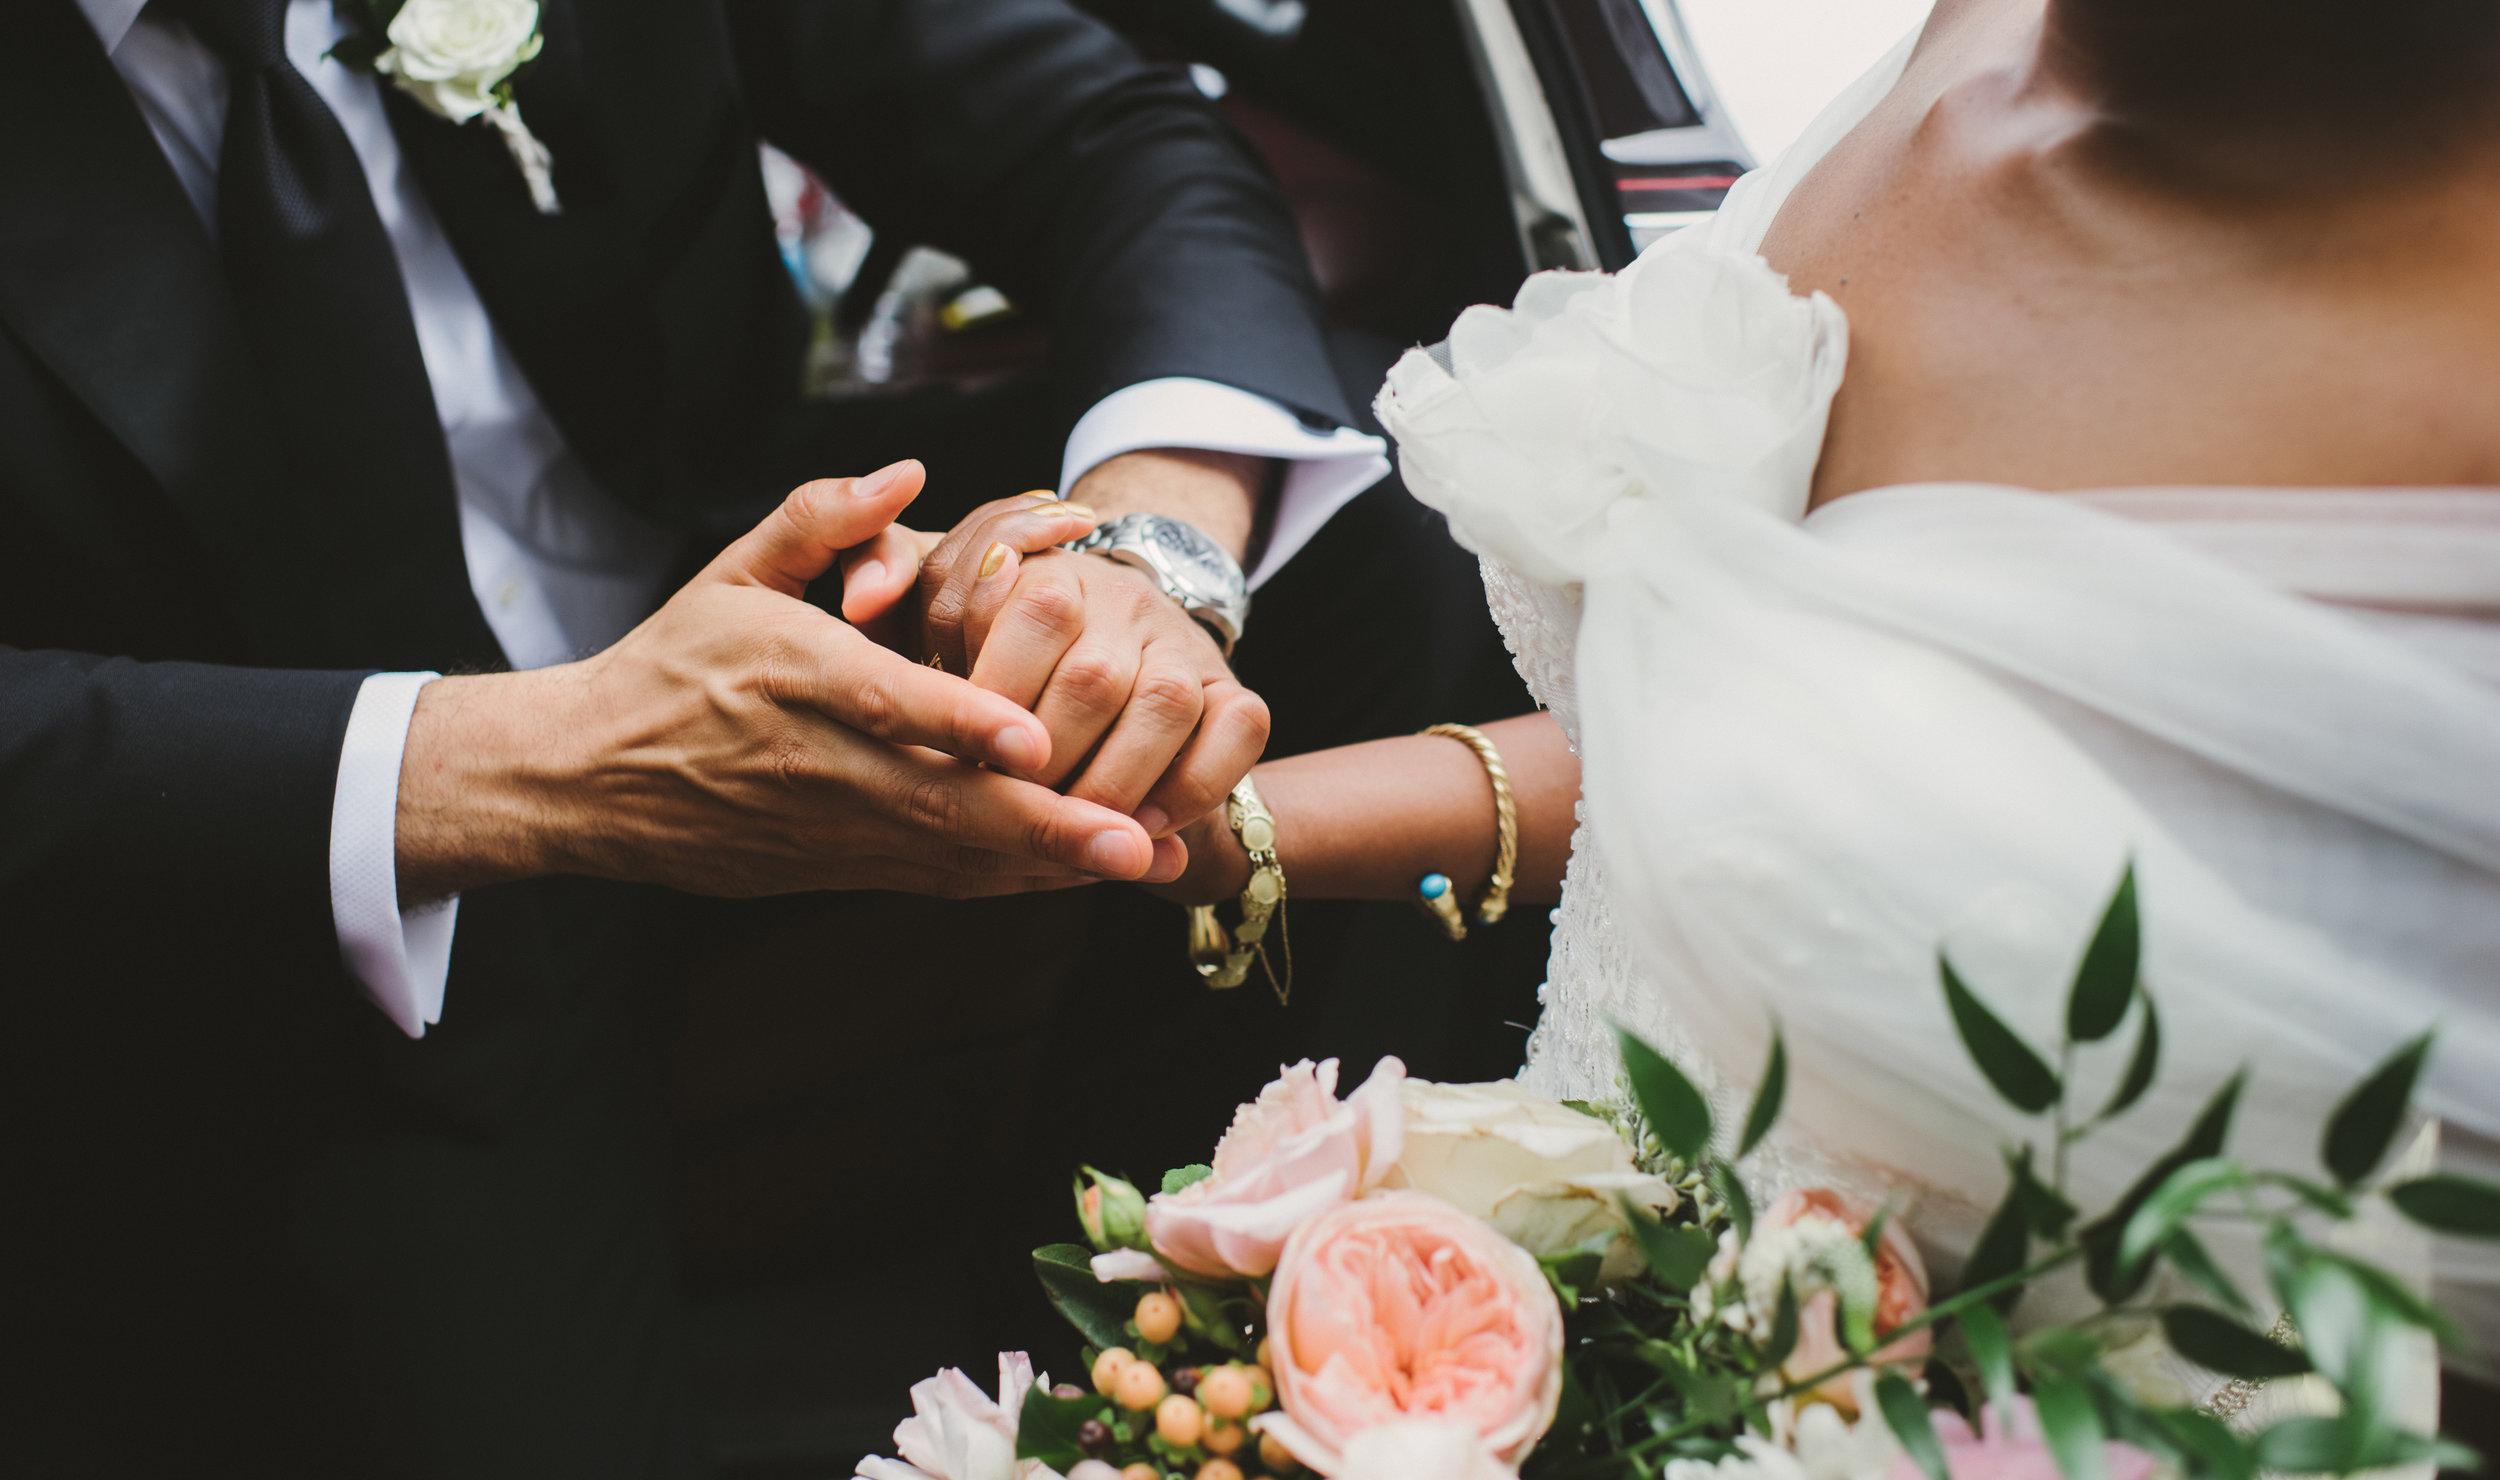 GLENVIEW MANSION WEDDING - INTIMATE WEDDING PHOTOGRAPHER - TWOTWENTY by CHI-CHI AGBIM-183.jpg